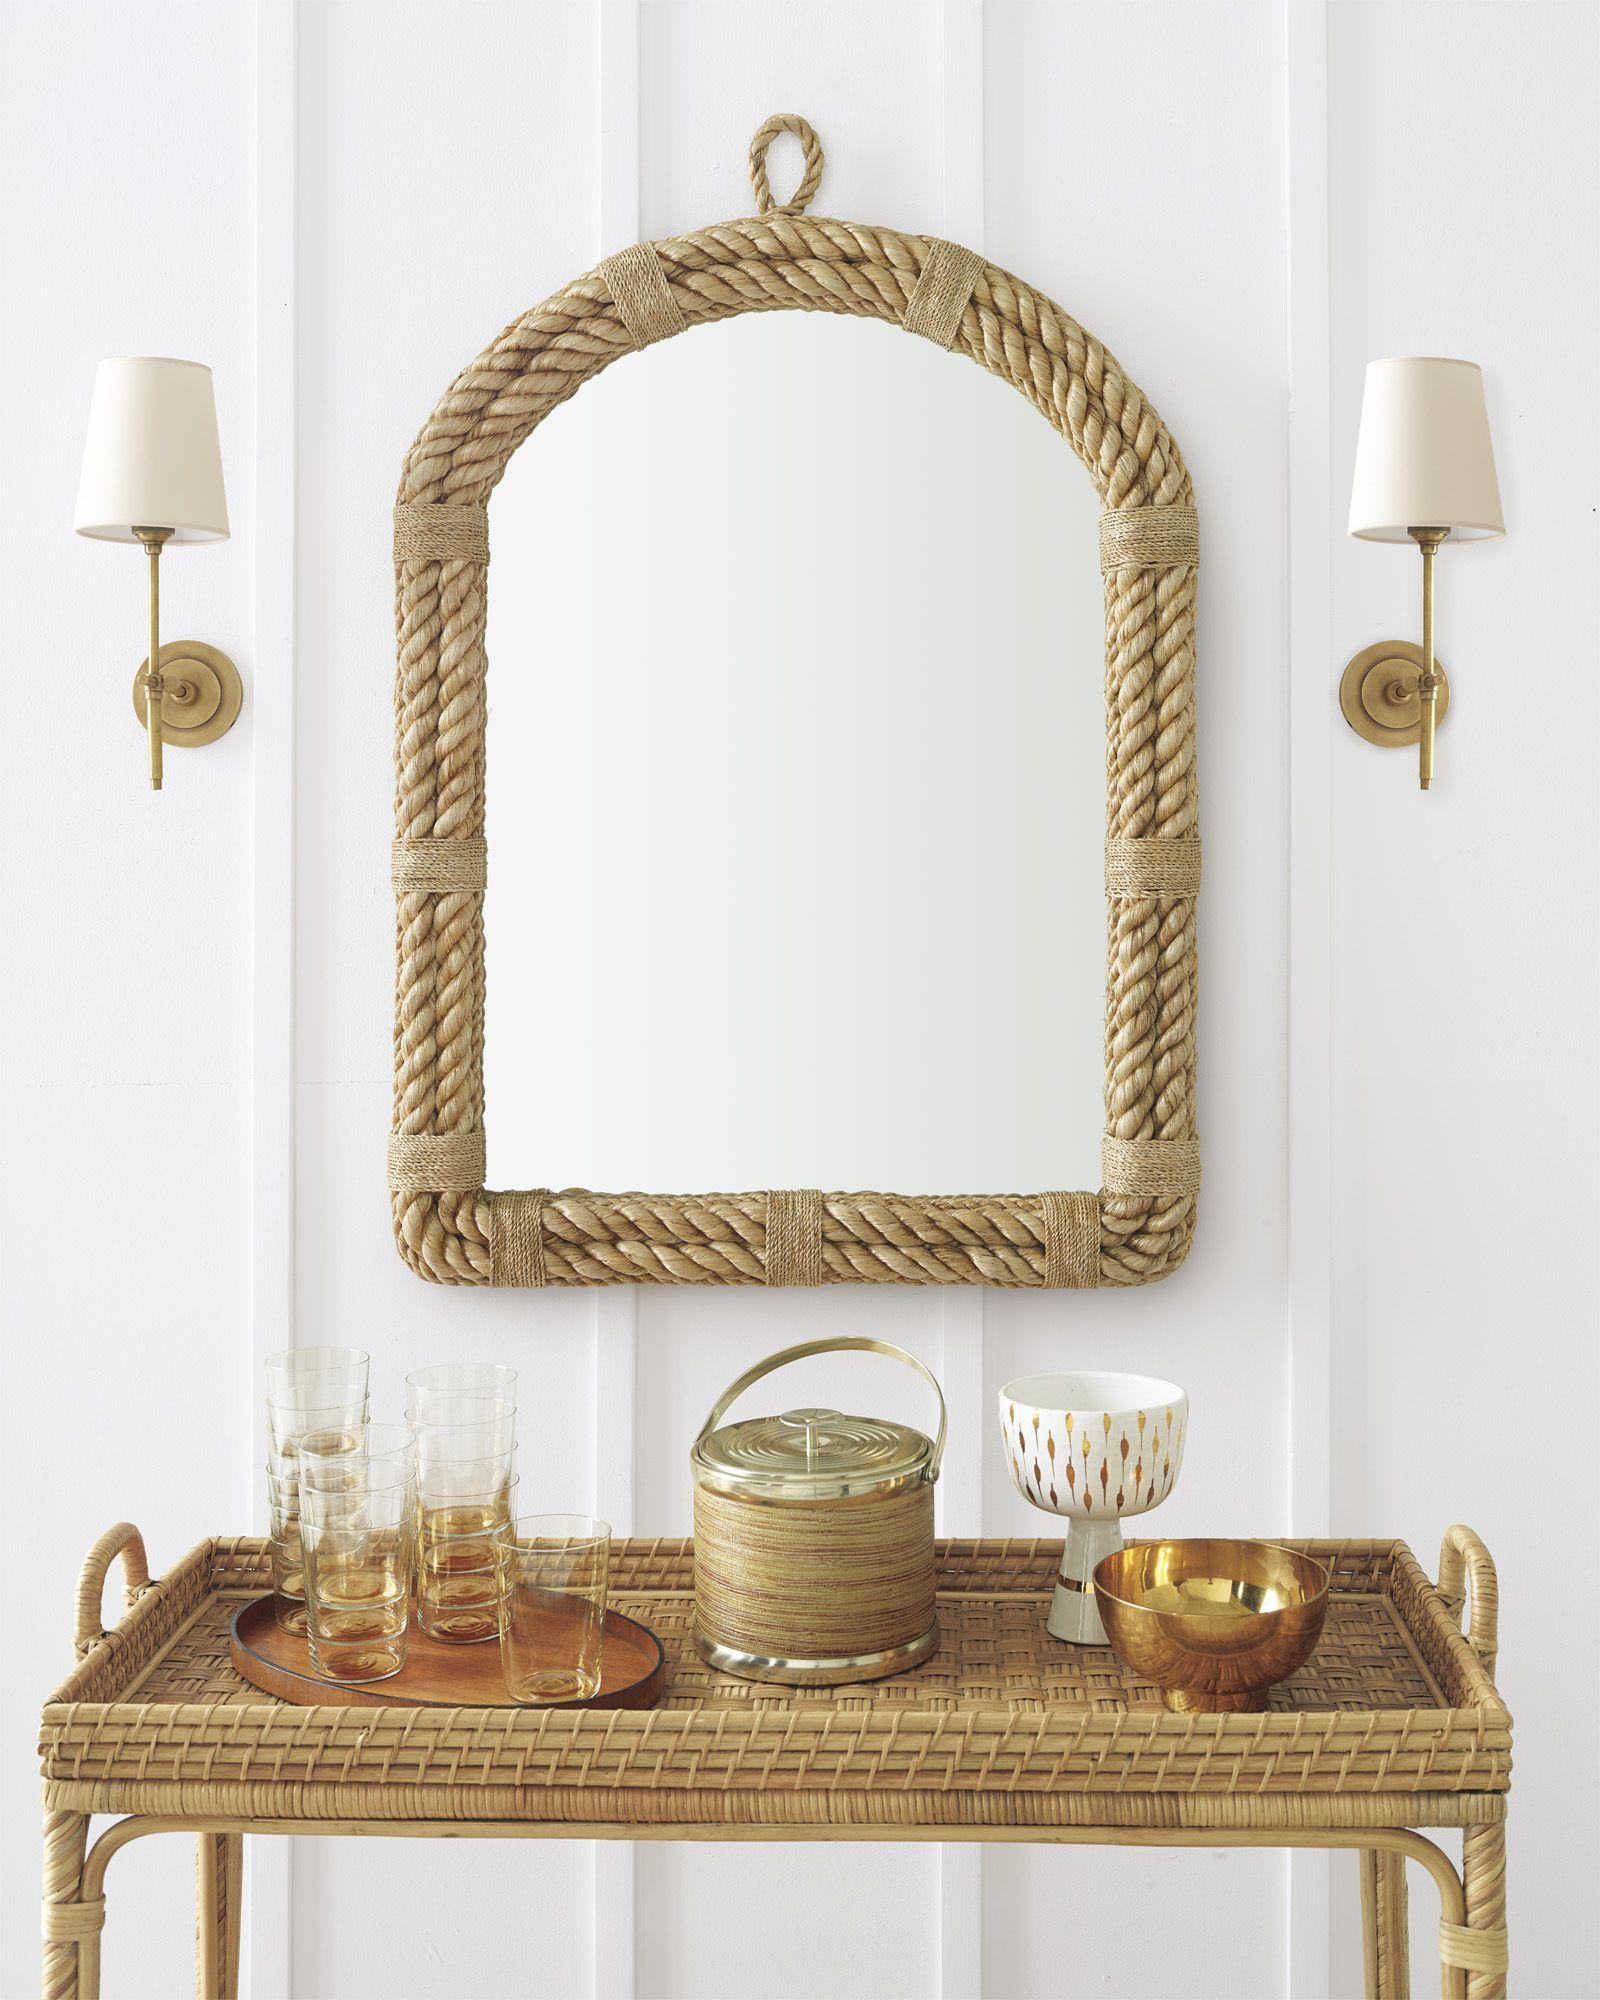 Nautical Rope Arch MirrorNautical Rope Arch Mirror | Hawks ...